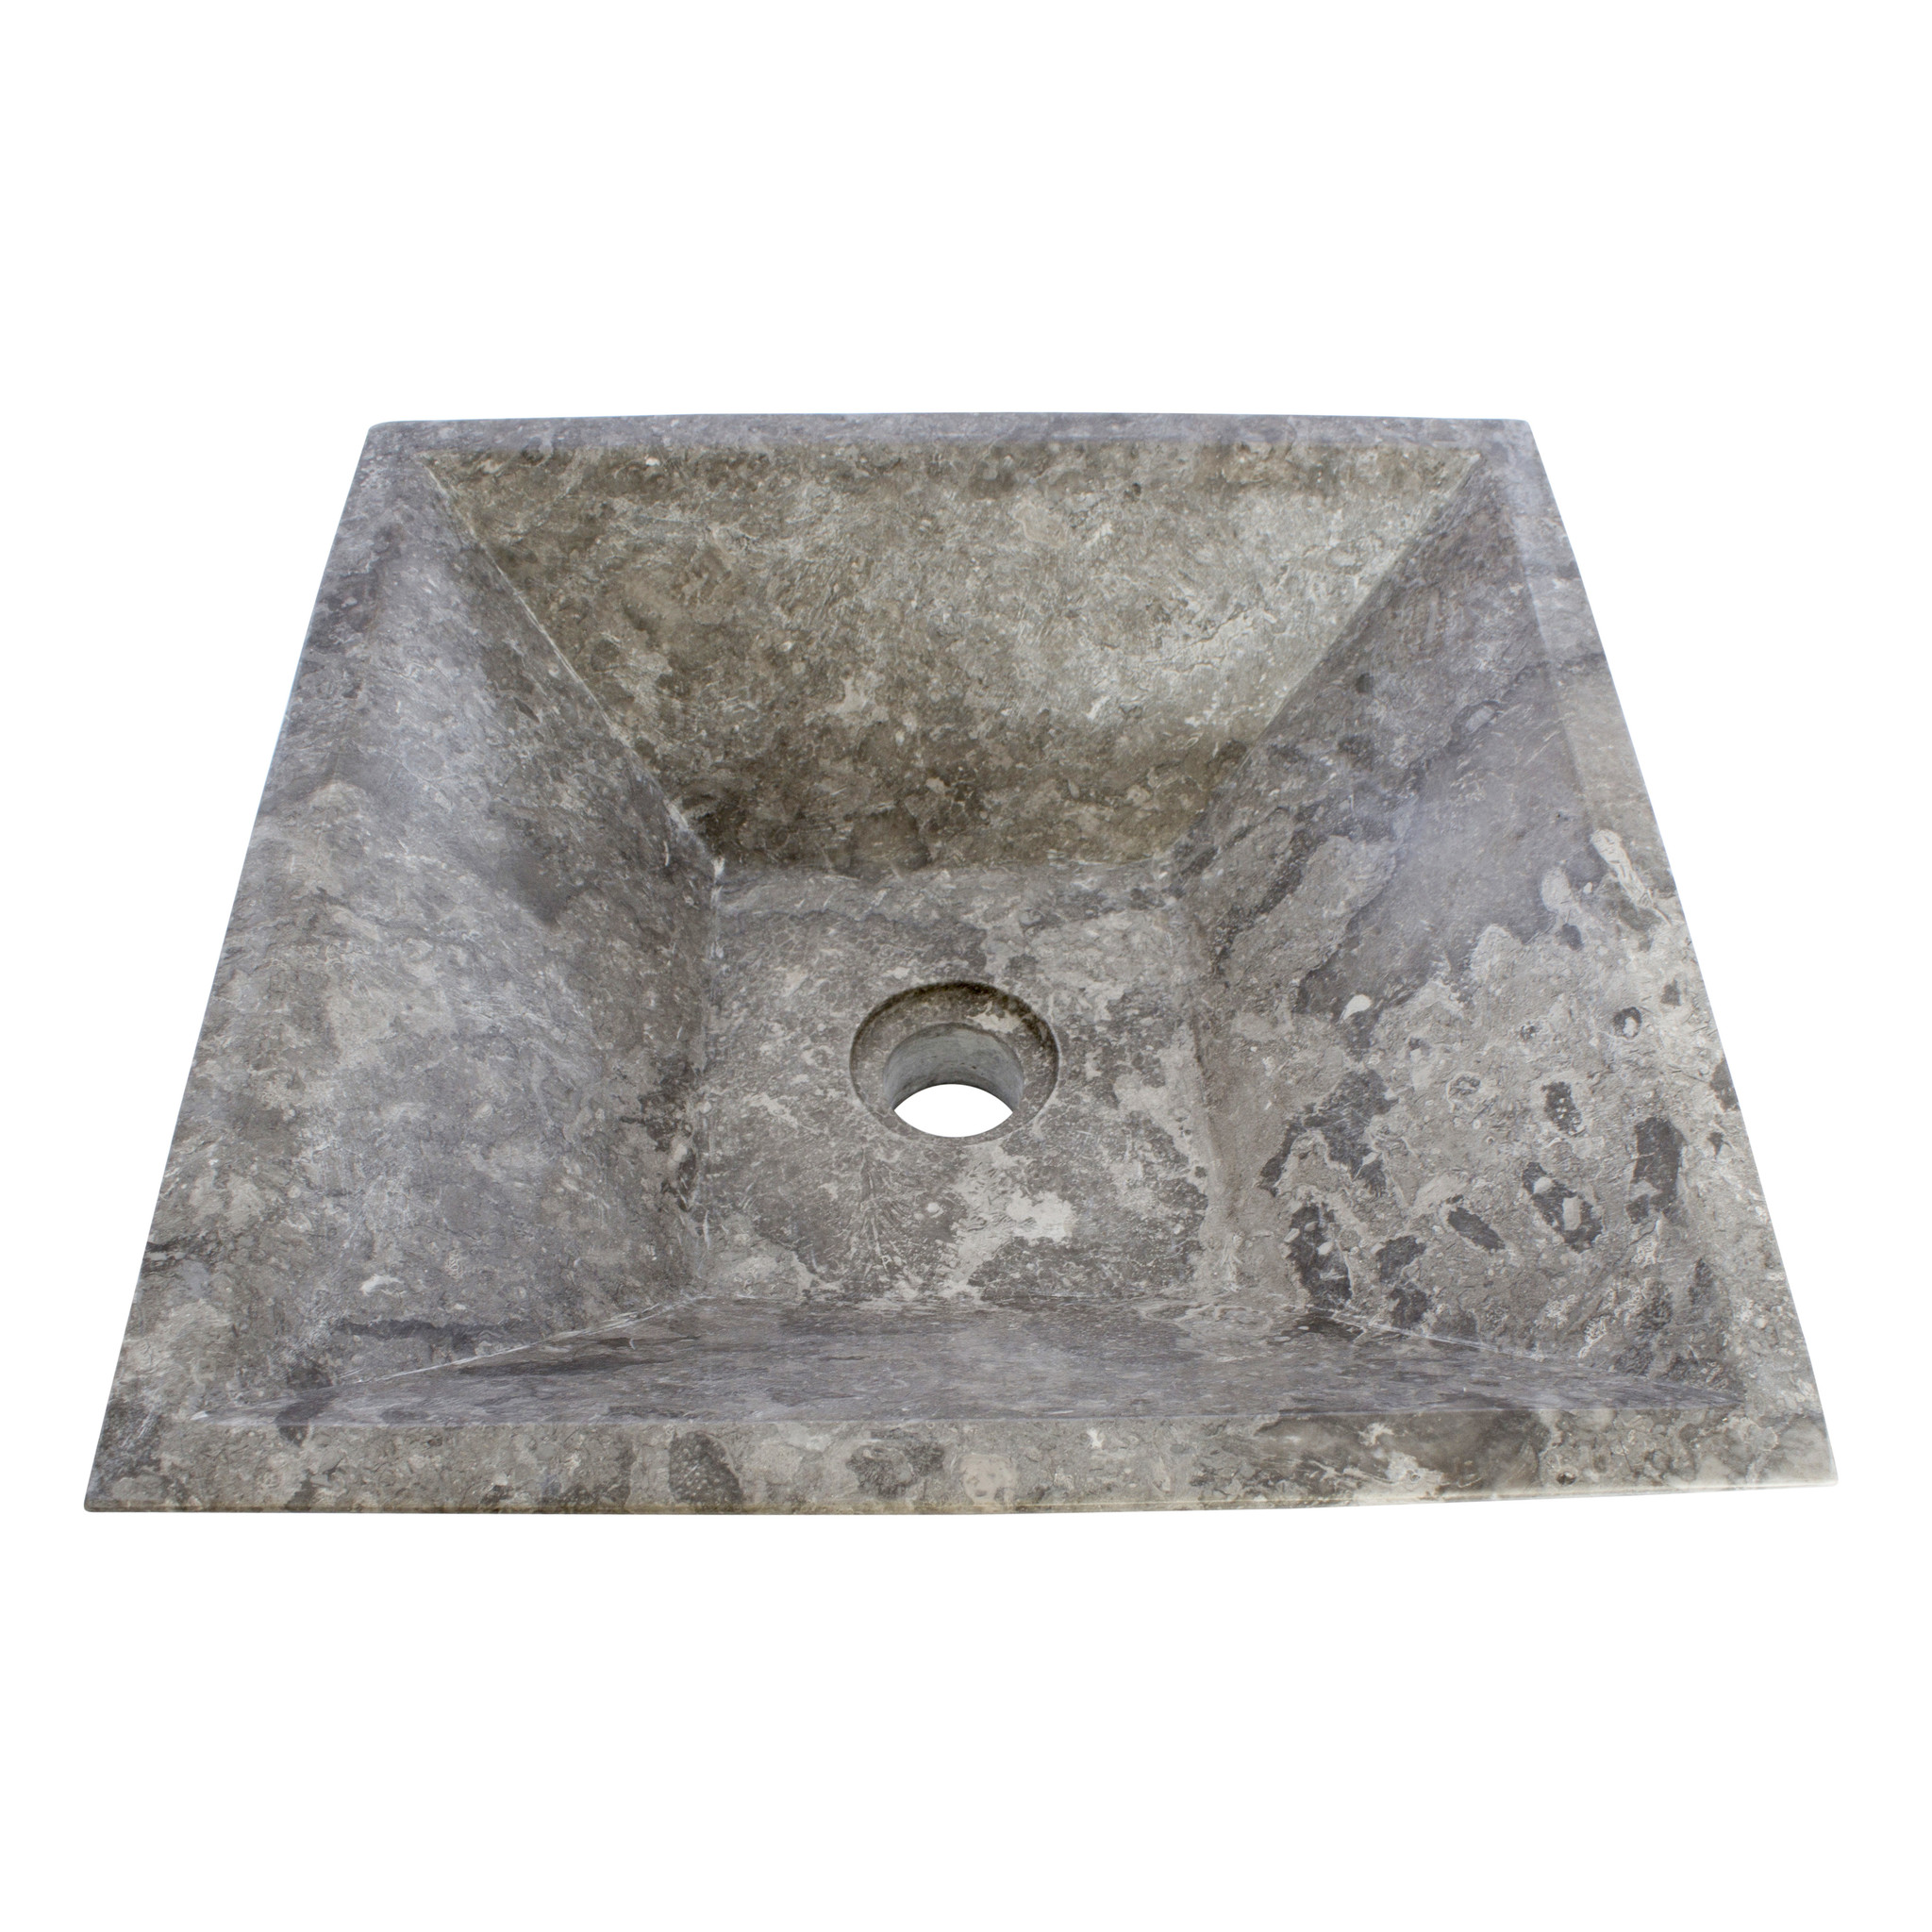 Indomarmer Grauem Marmor Waschbecken Kotak Piramide 40 x 40 x 15 cm